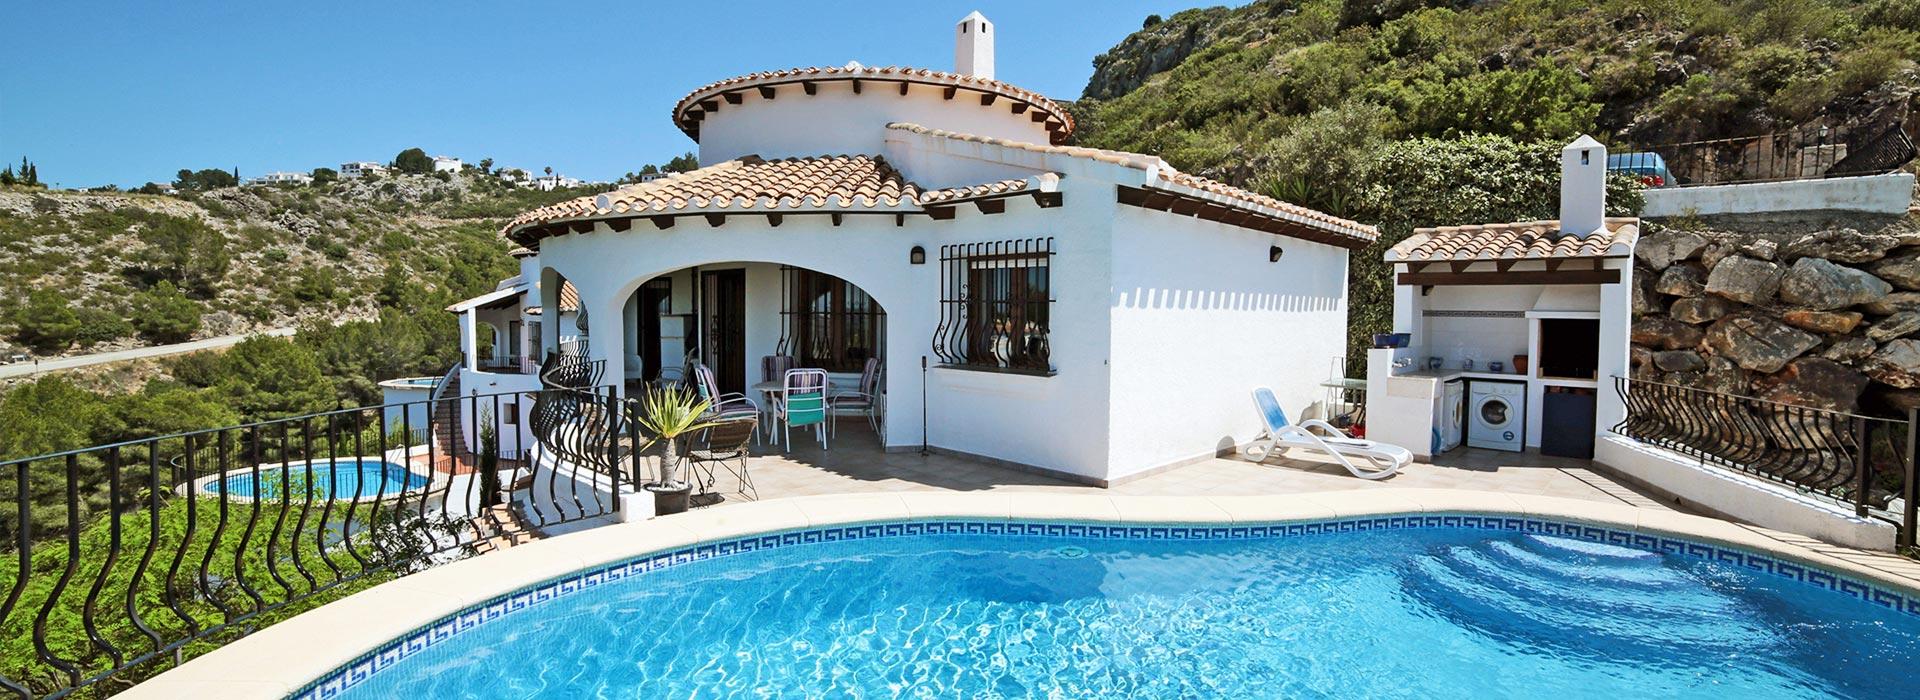 acb.immo - Villa de 4 chambres avec piscine et vue mer à Monte Pego, Denia